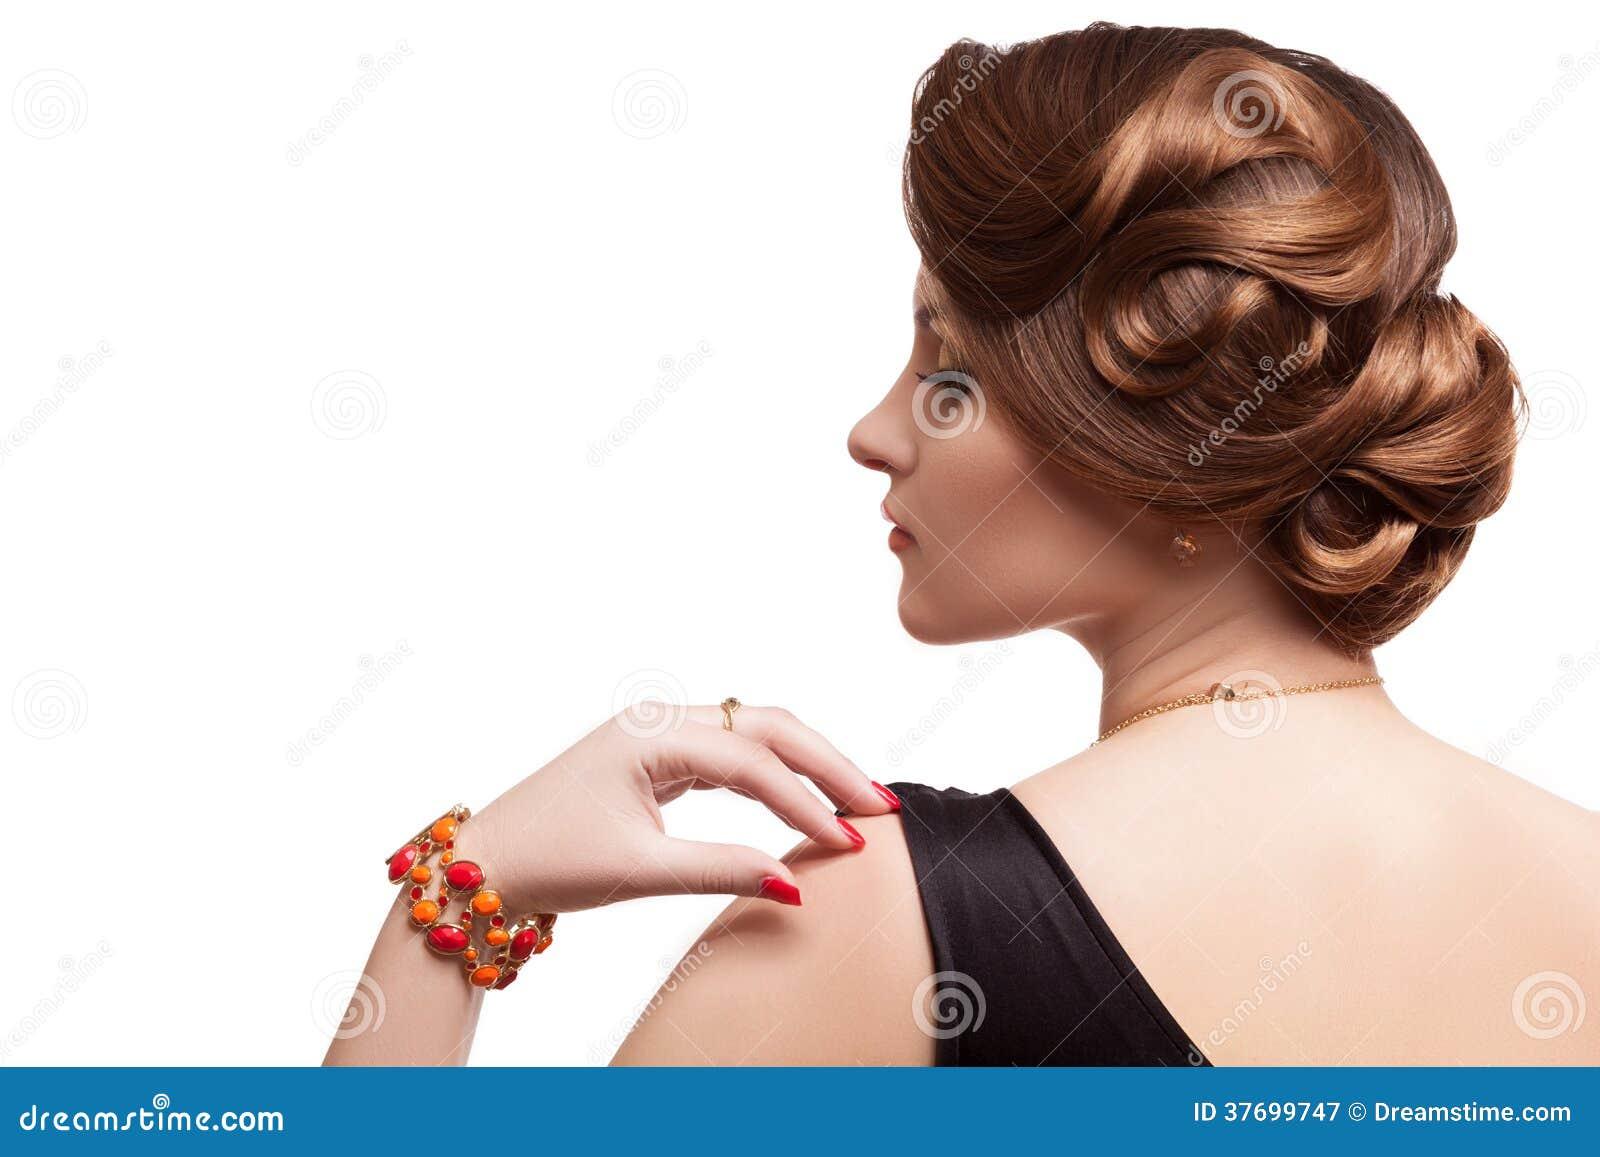 hairstyle background - photo #5